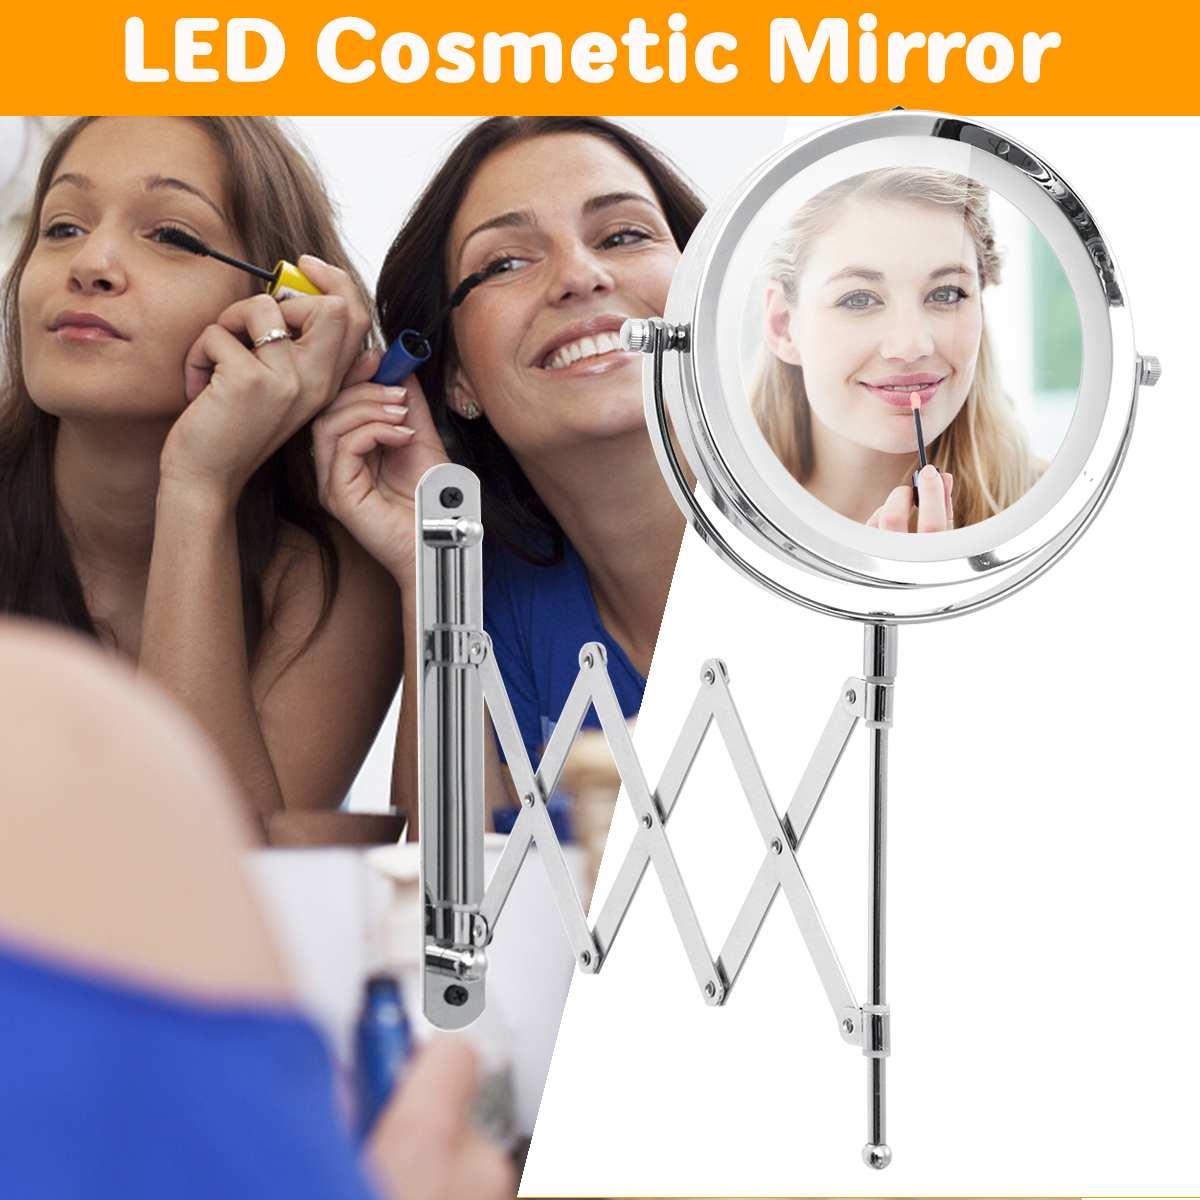 6 3X Mirror Extendable Magnifying Makeup Shaving Wall Mount LED Light Bathroom Makeup Mirrors6 3X Mirror Extendable Magnifying Makeup Shaving Wall Mount LED Light Bathroom Makeup Mirrors